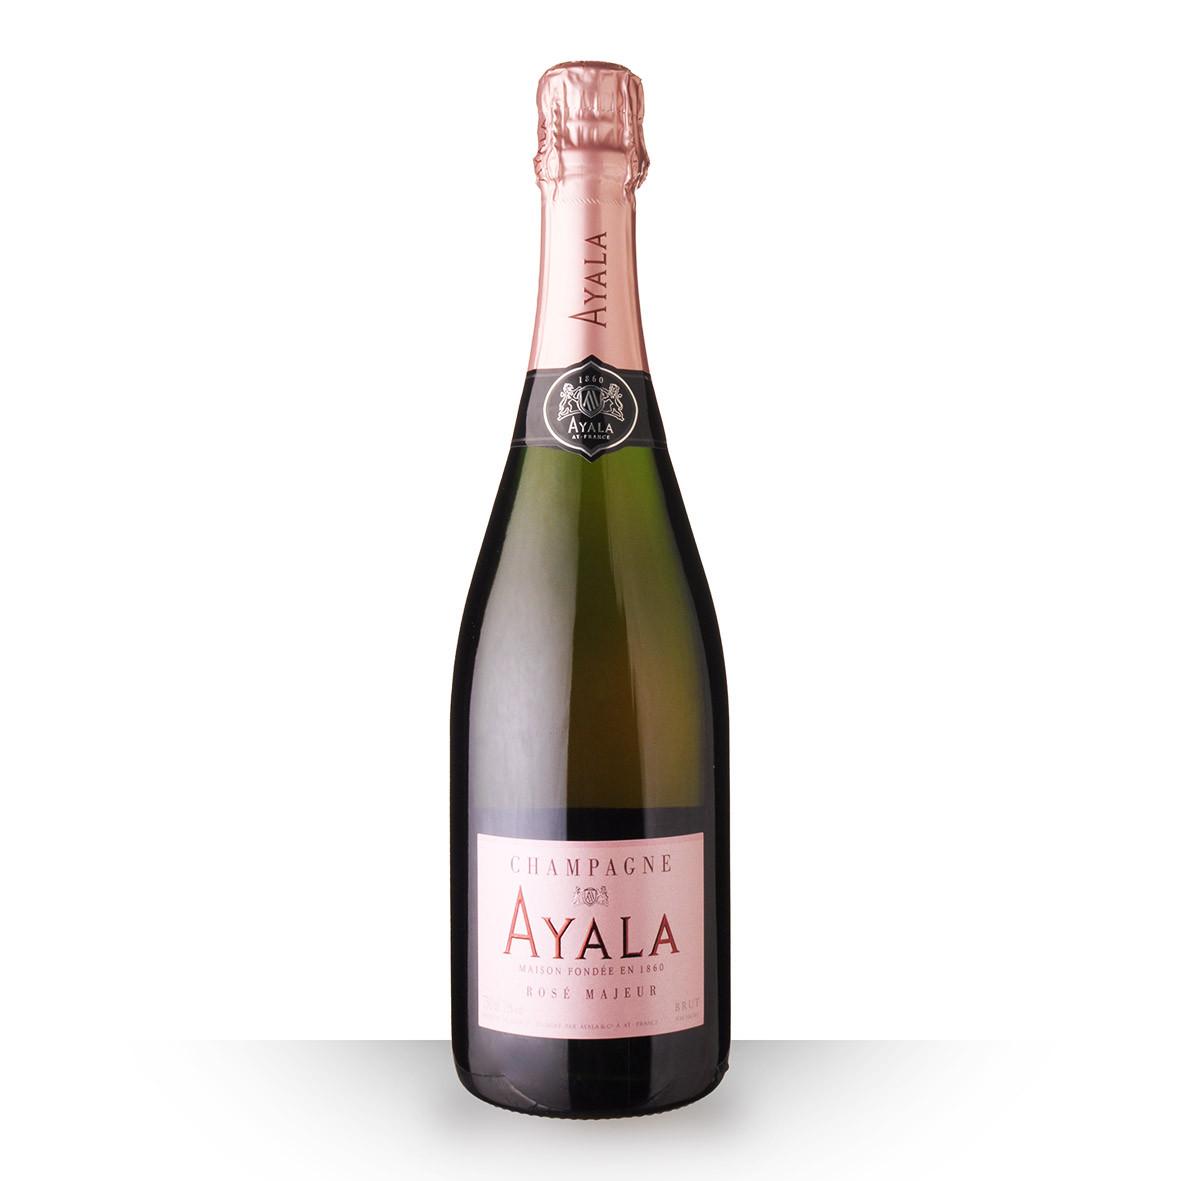 Champagne Ayala Rosé Majeur 75cl www.odyssee-vins.com